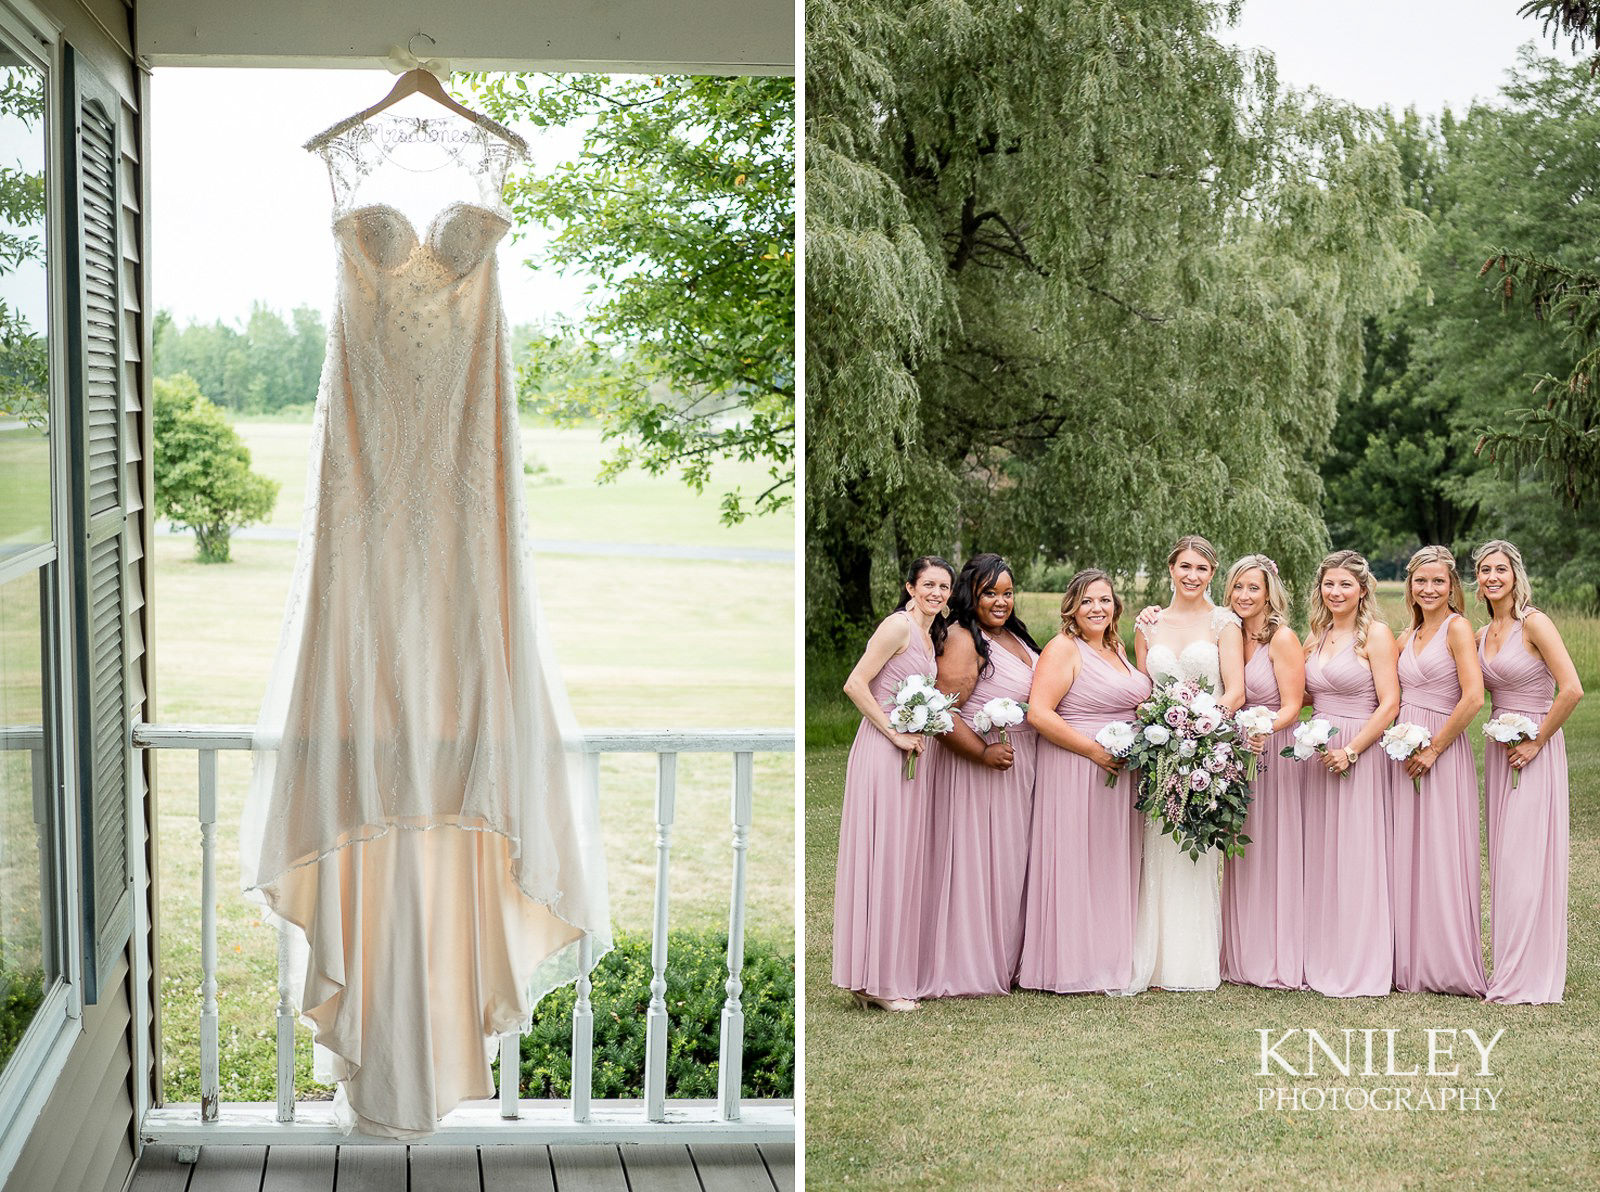 027 - Ontario Golf Club Wedding Pictures.jpg